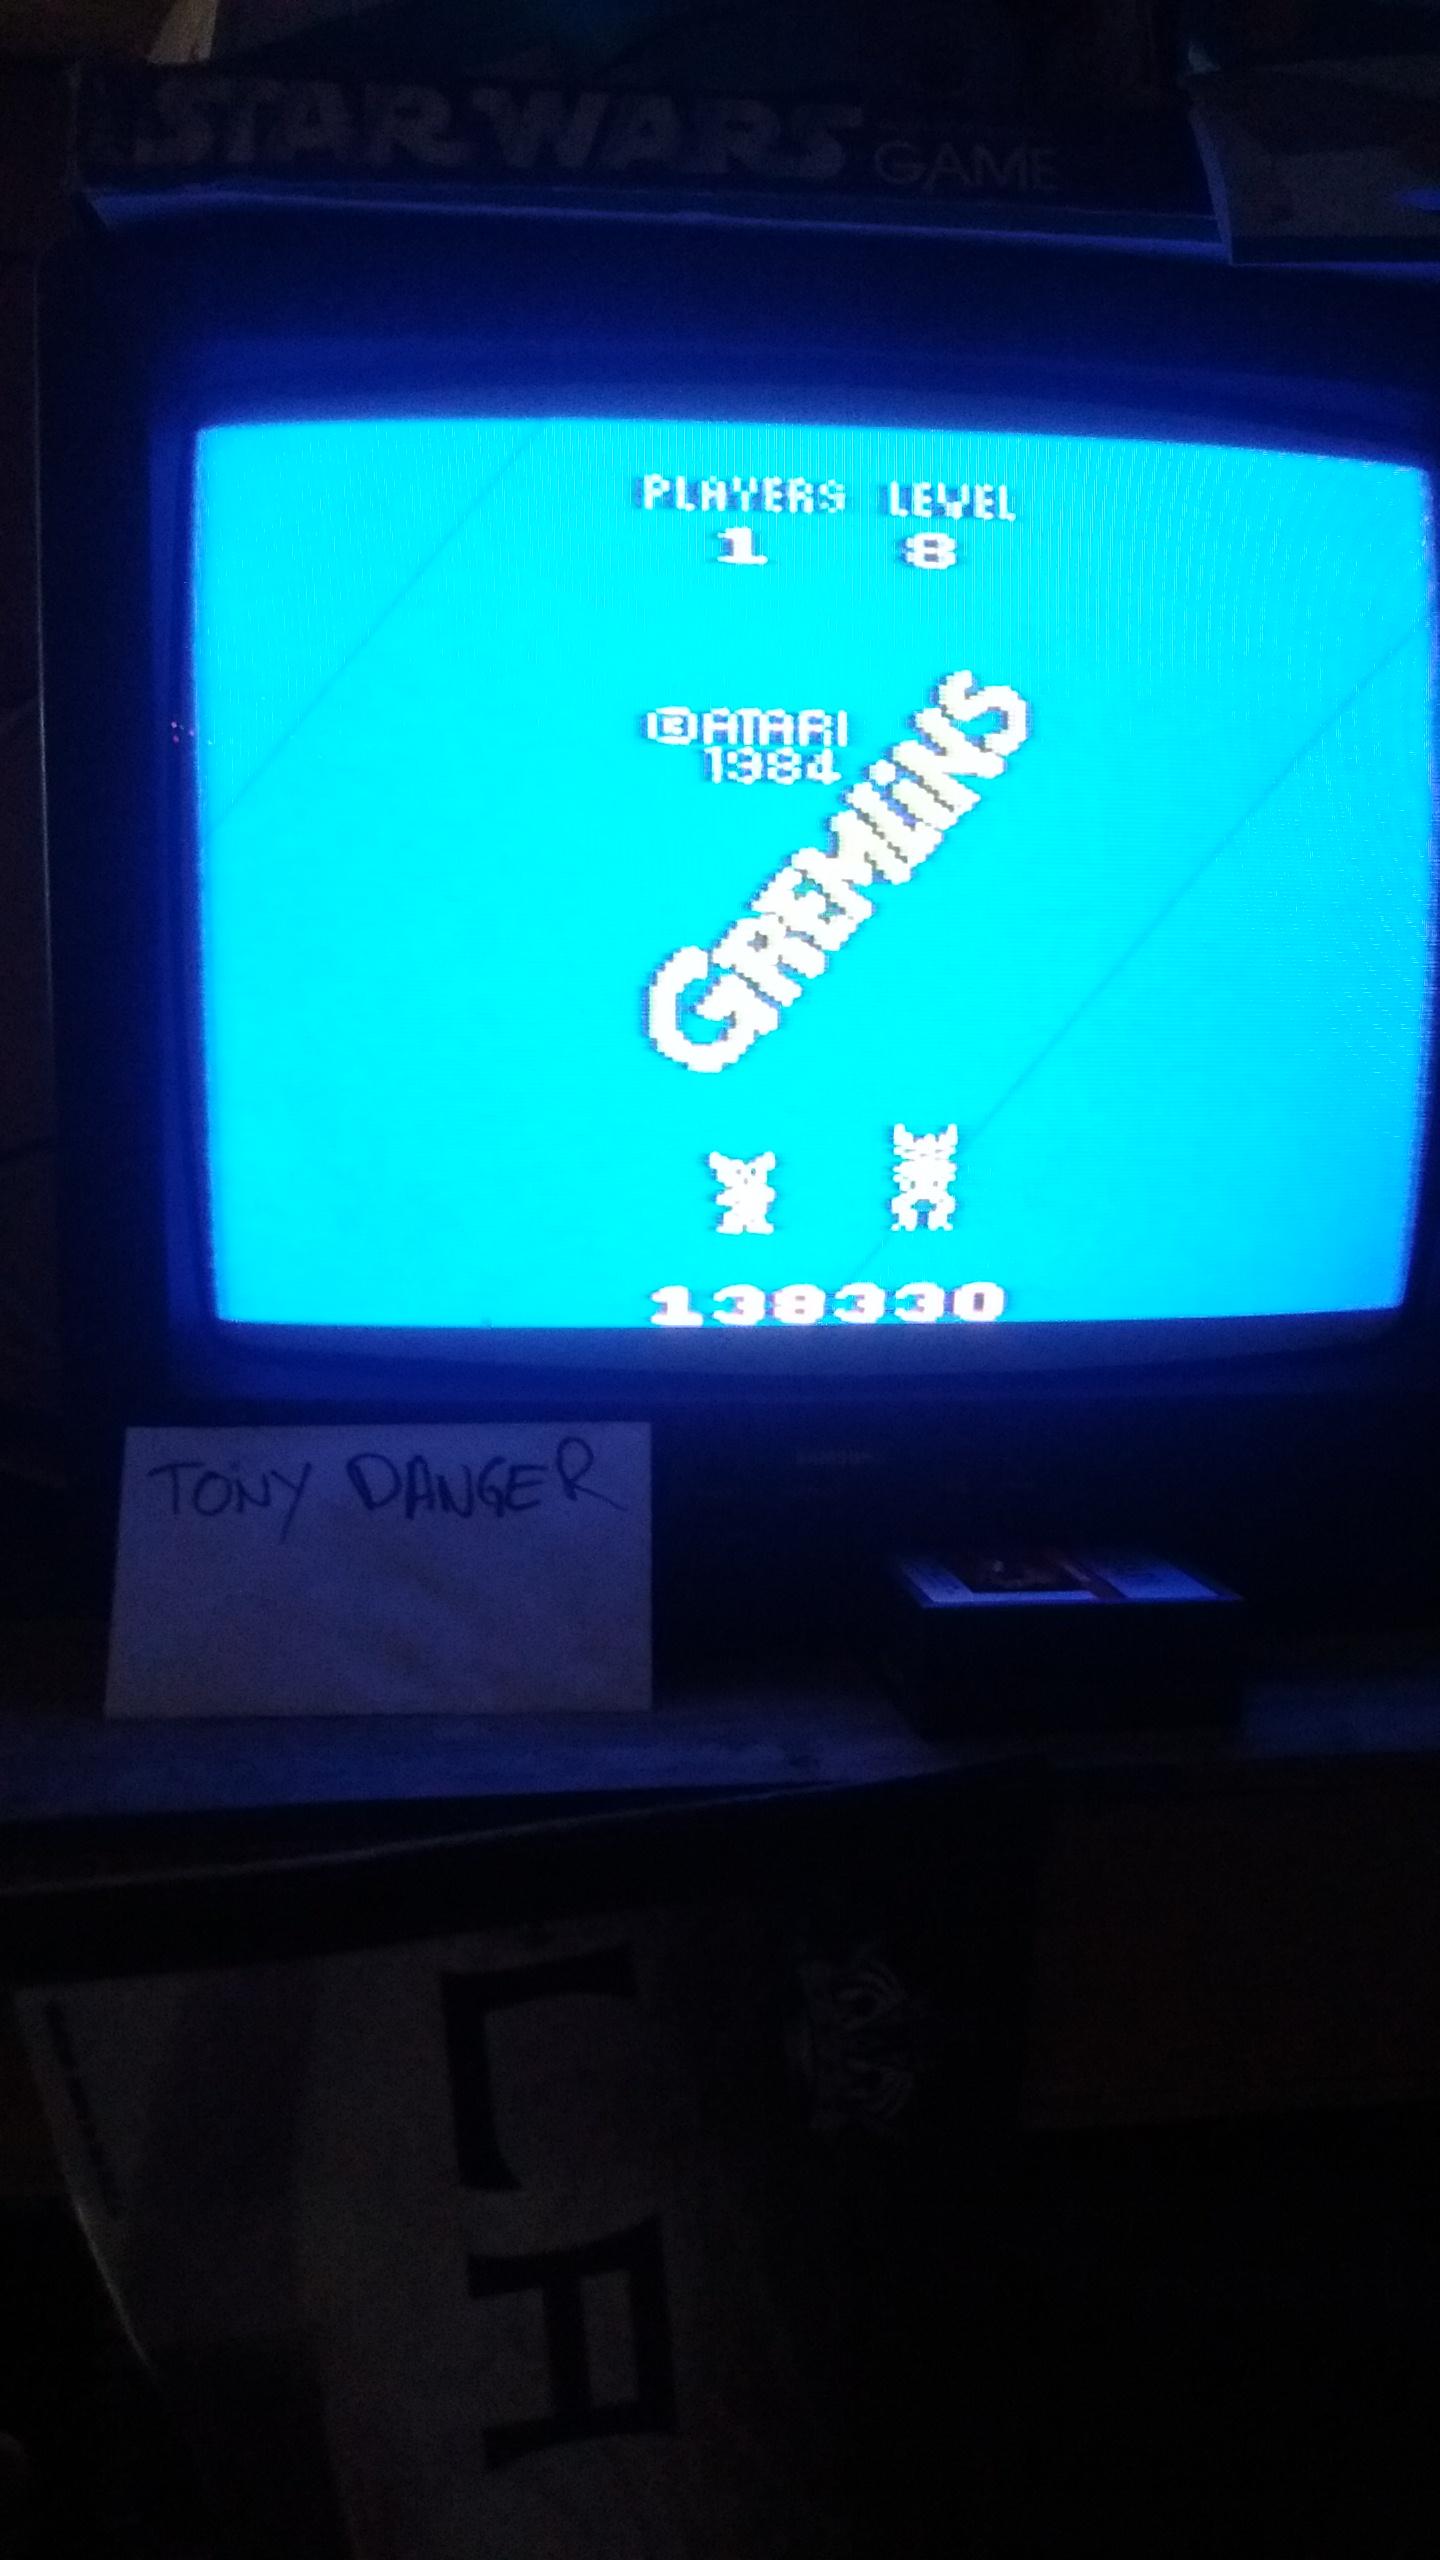 TonyDanger: Gremlins (Atari 2600 Expert/A) 138,330 points on 2016-12-02 10:10:44